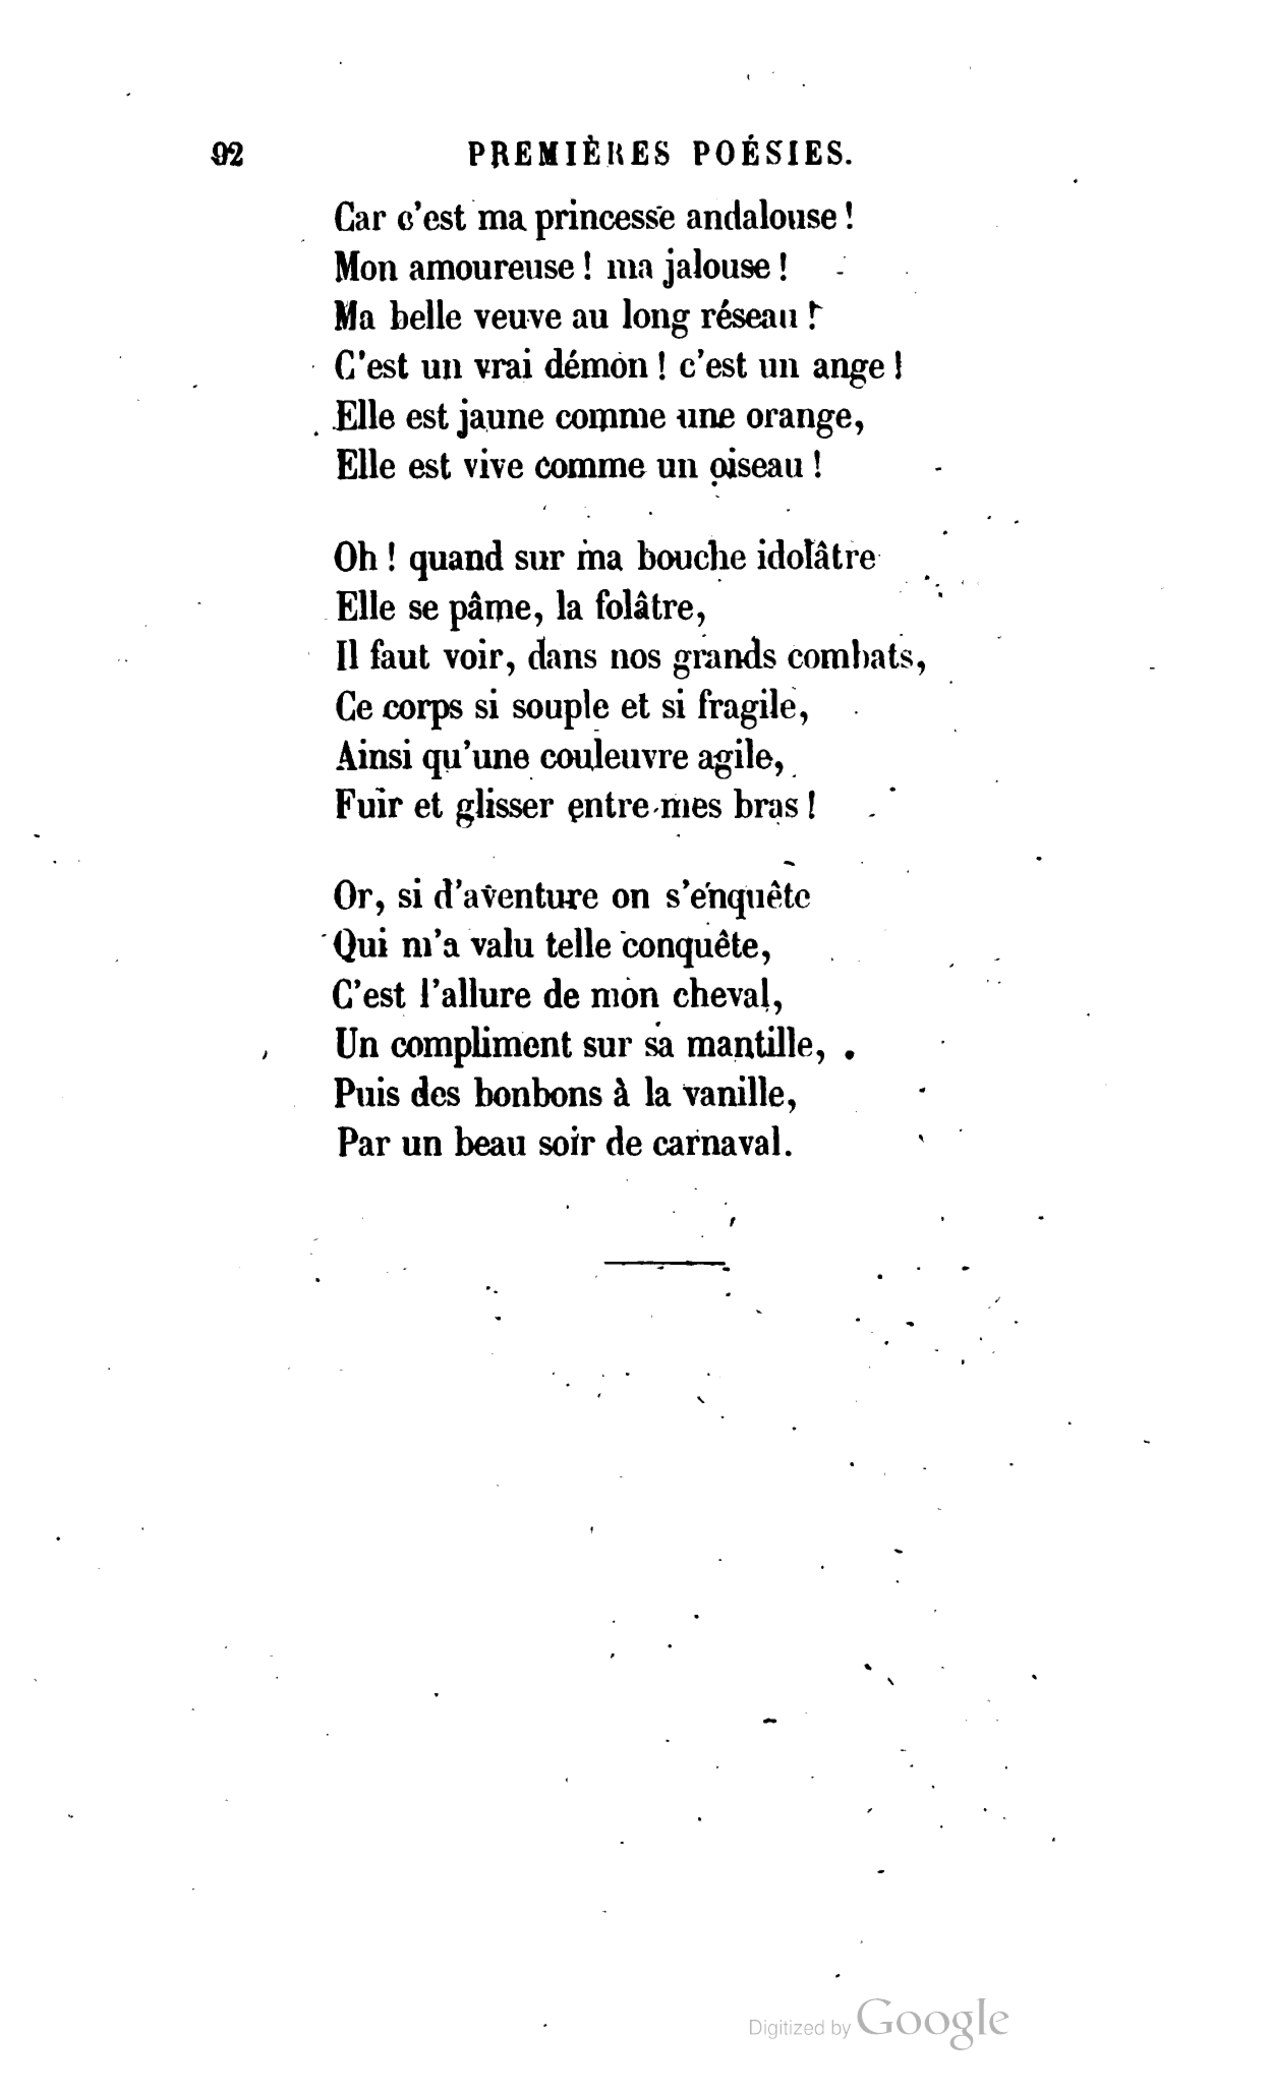 Pagemusset Premières Poésies Charpentier 1863djvu94